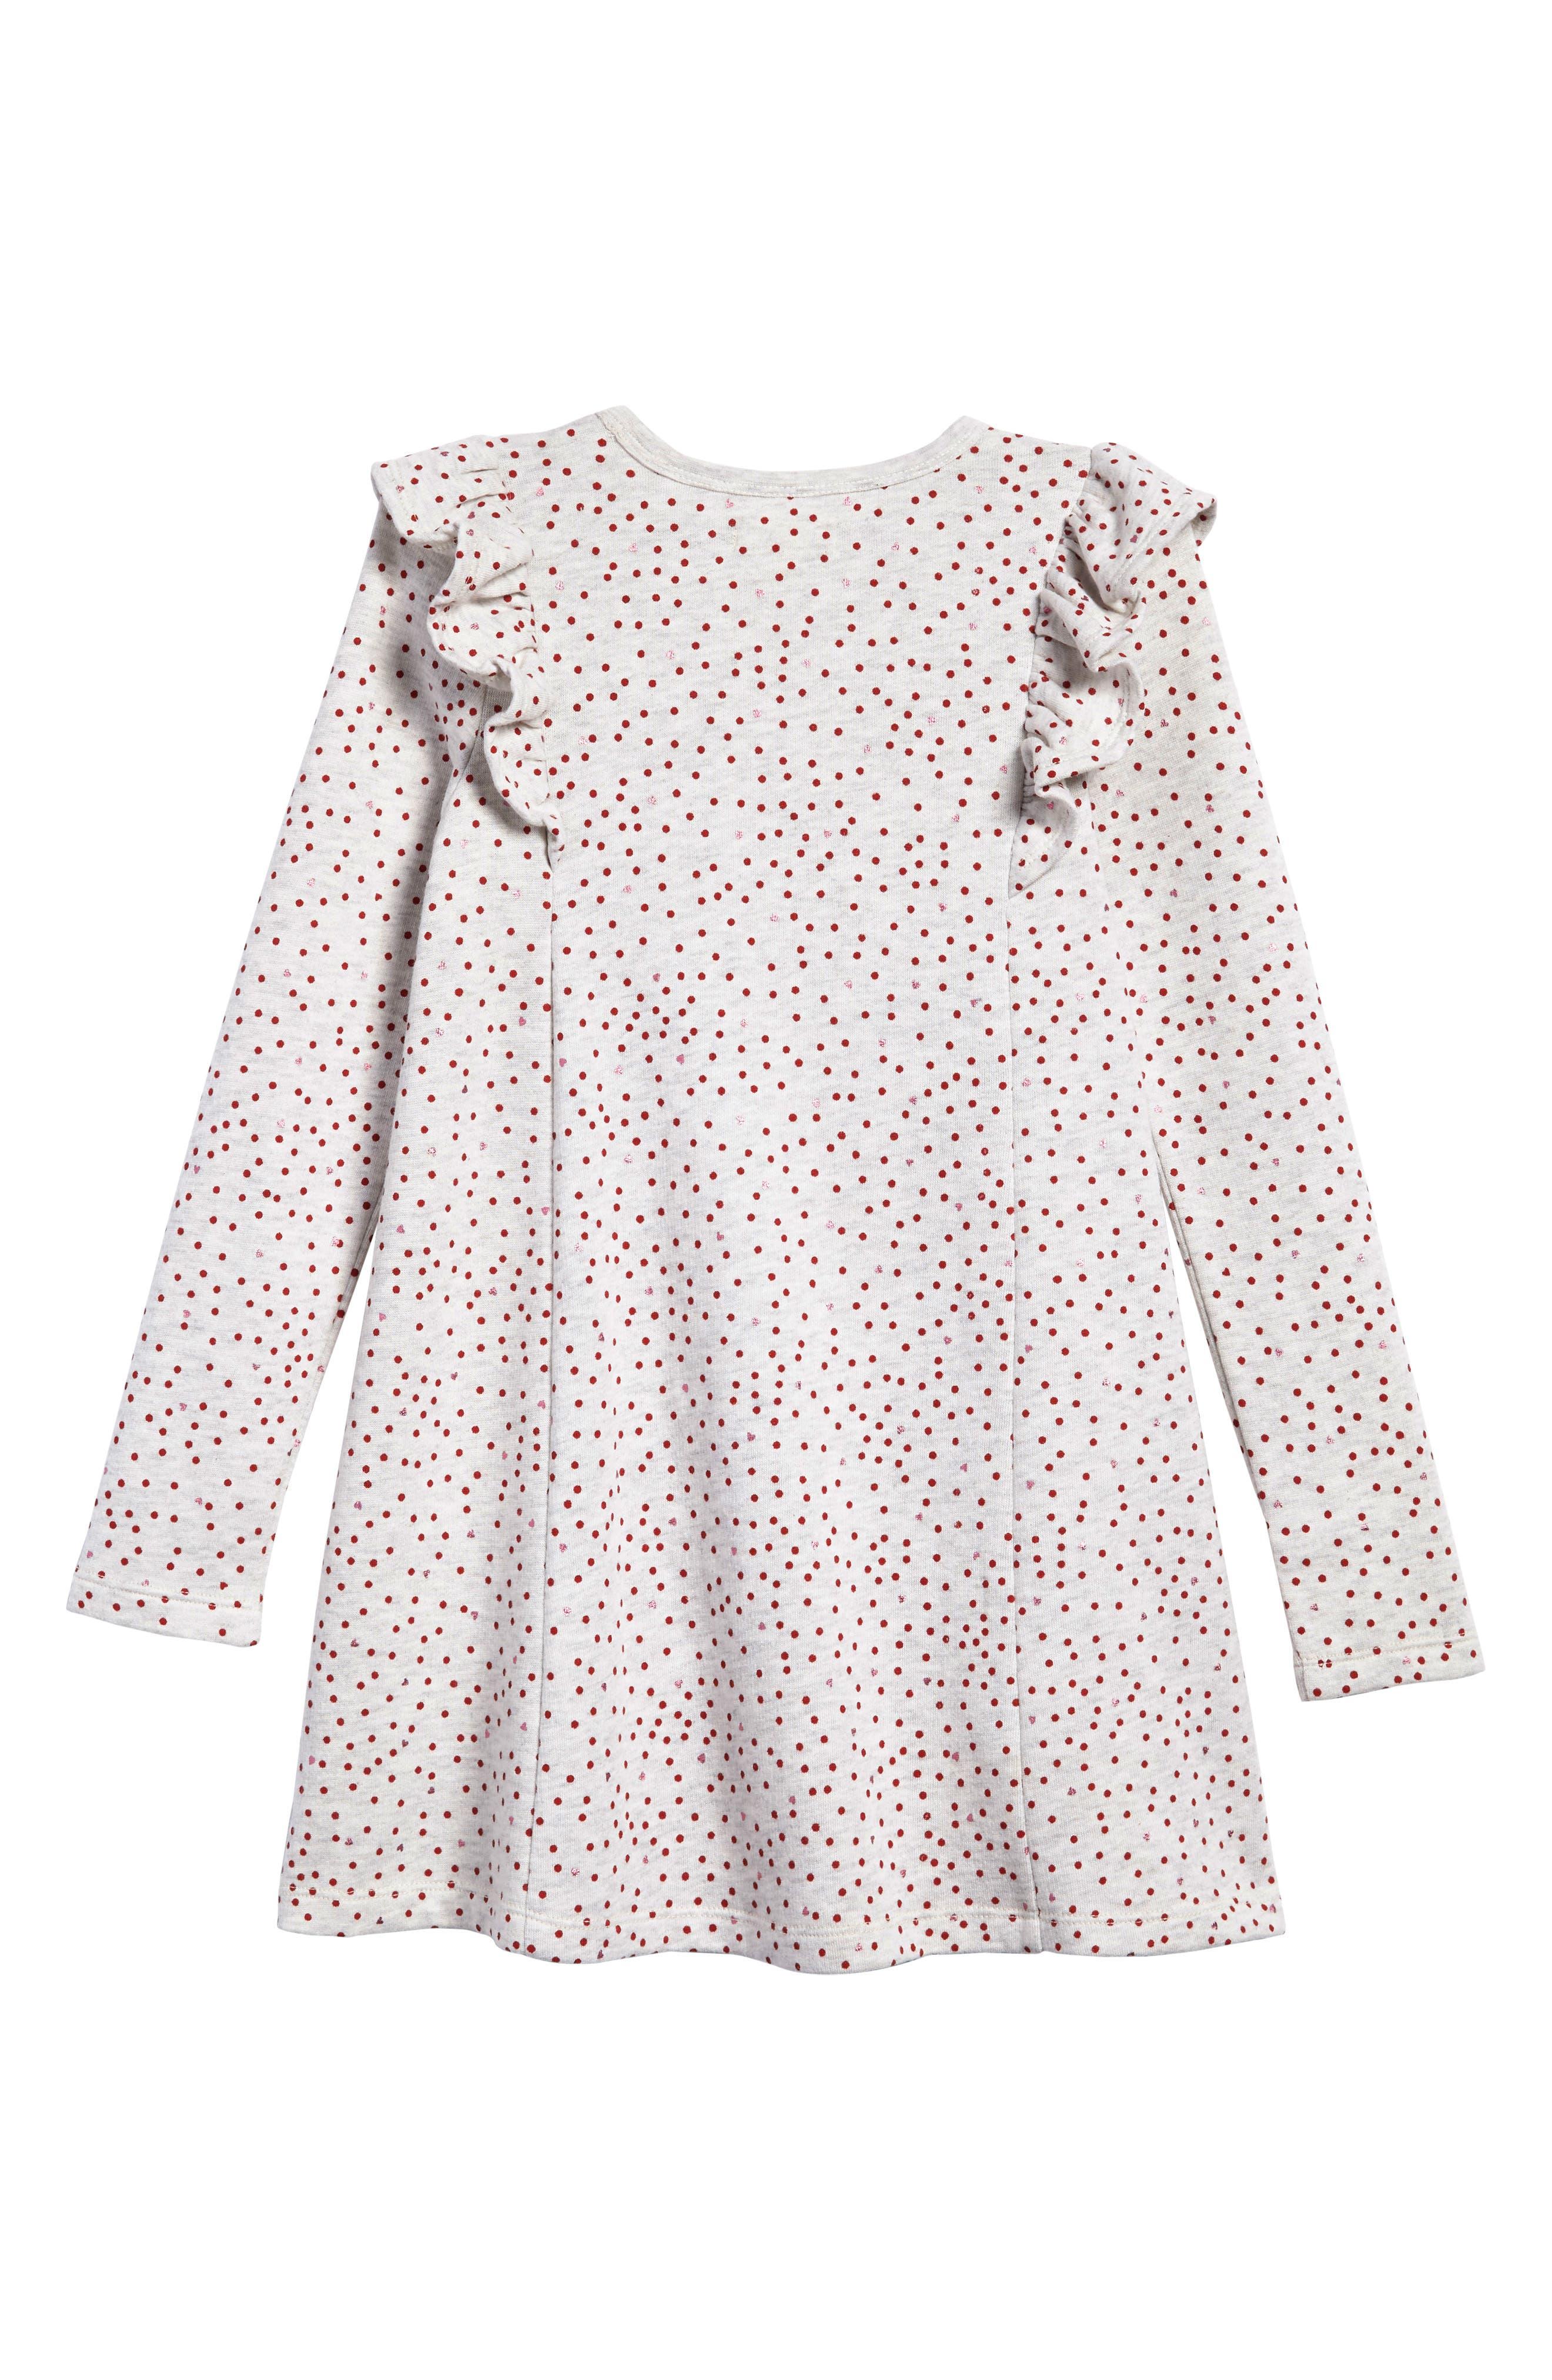 Alternate Image 2  - Tucker + Tate Ruffle Fleece Sweater Dress (Toddler Girls, Little Girls & Big Girls)